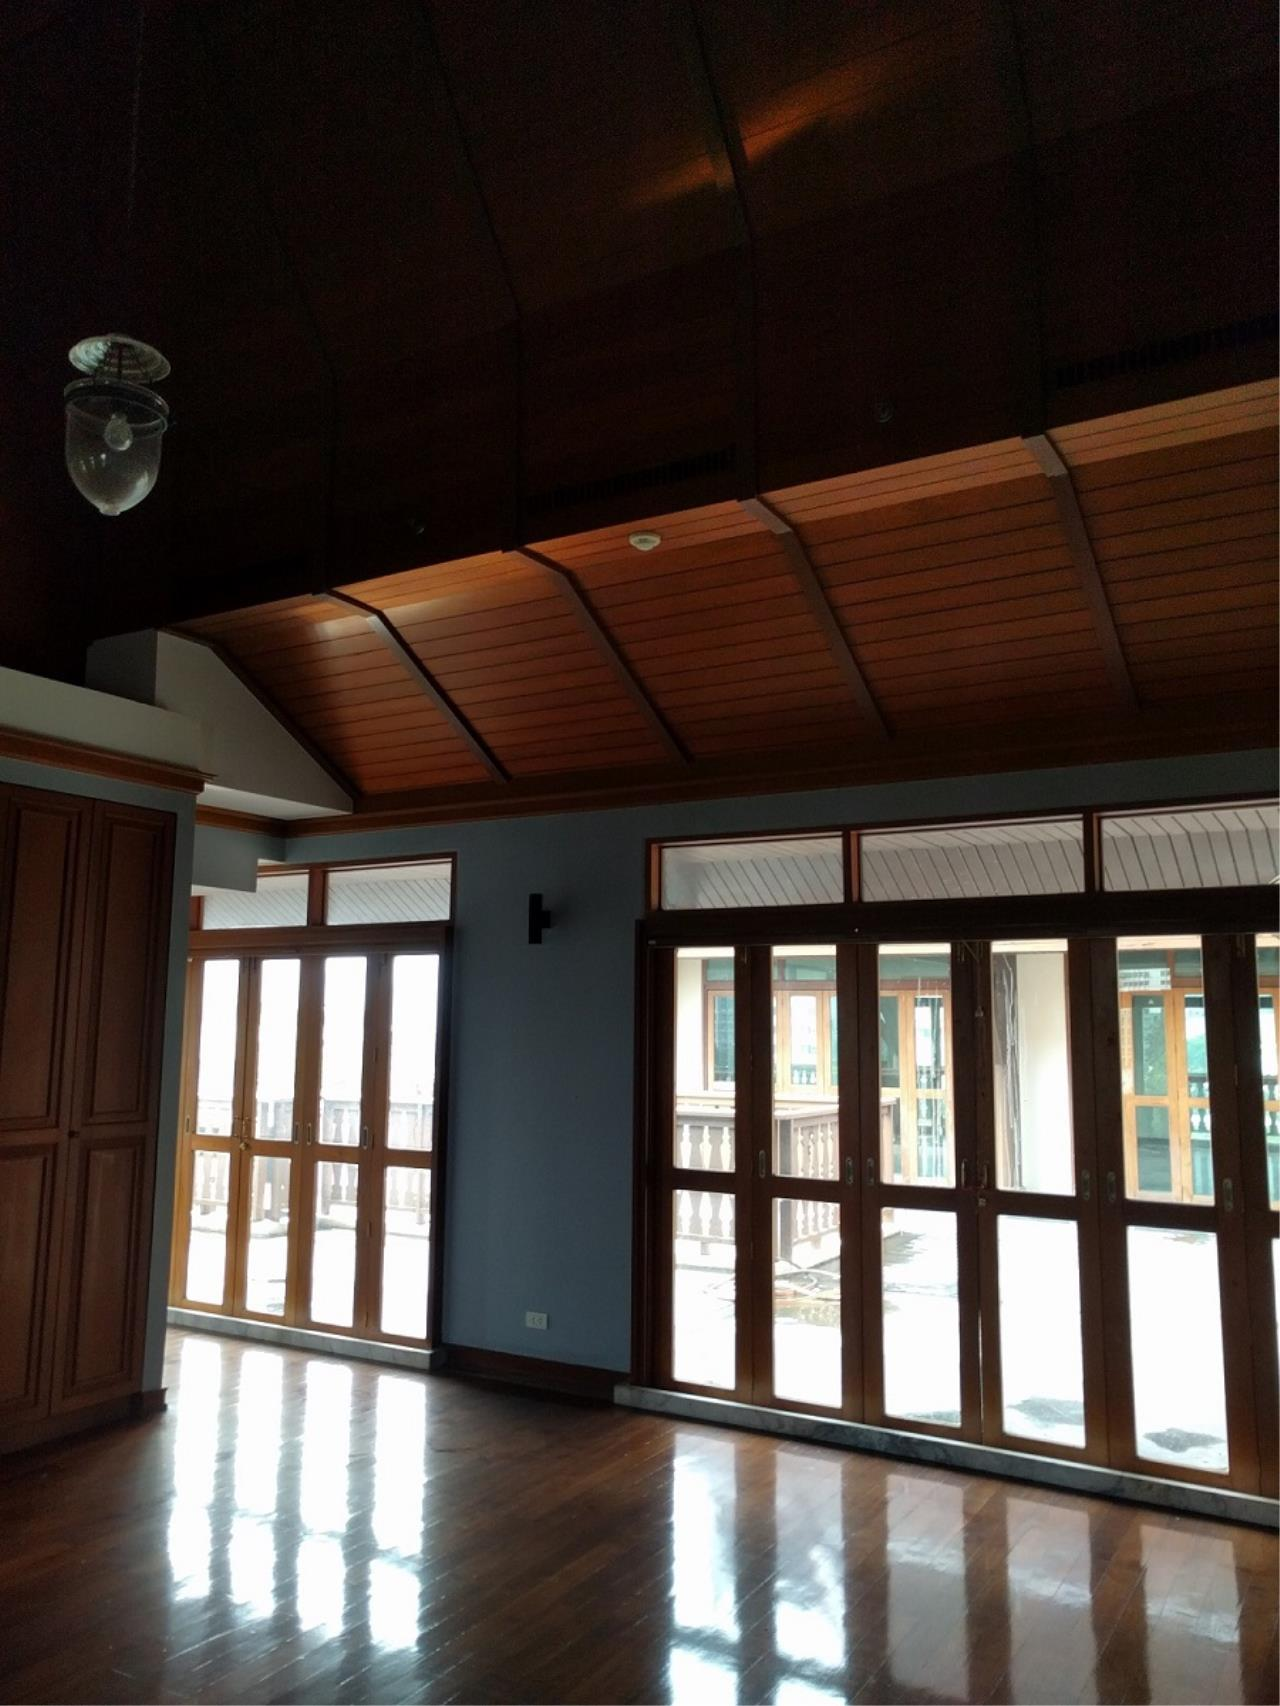 RE/MAX CondoDee Agency's Thai Elegance Luxury Condominium - Entire Building for Sale 21